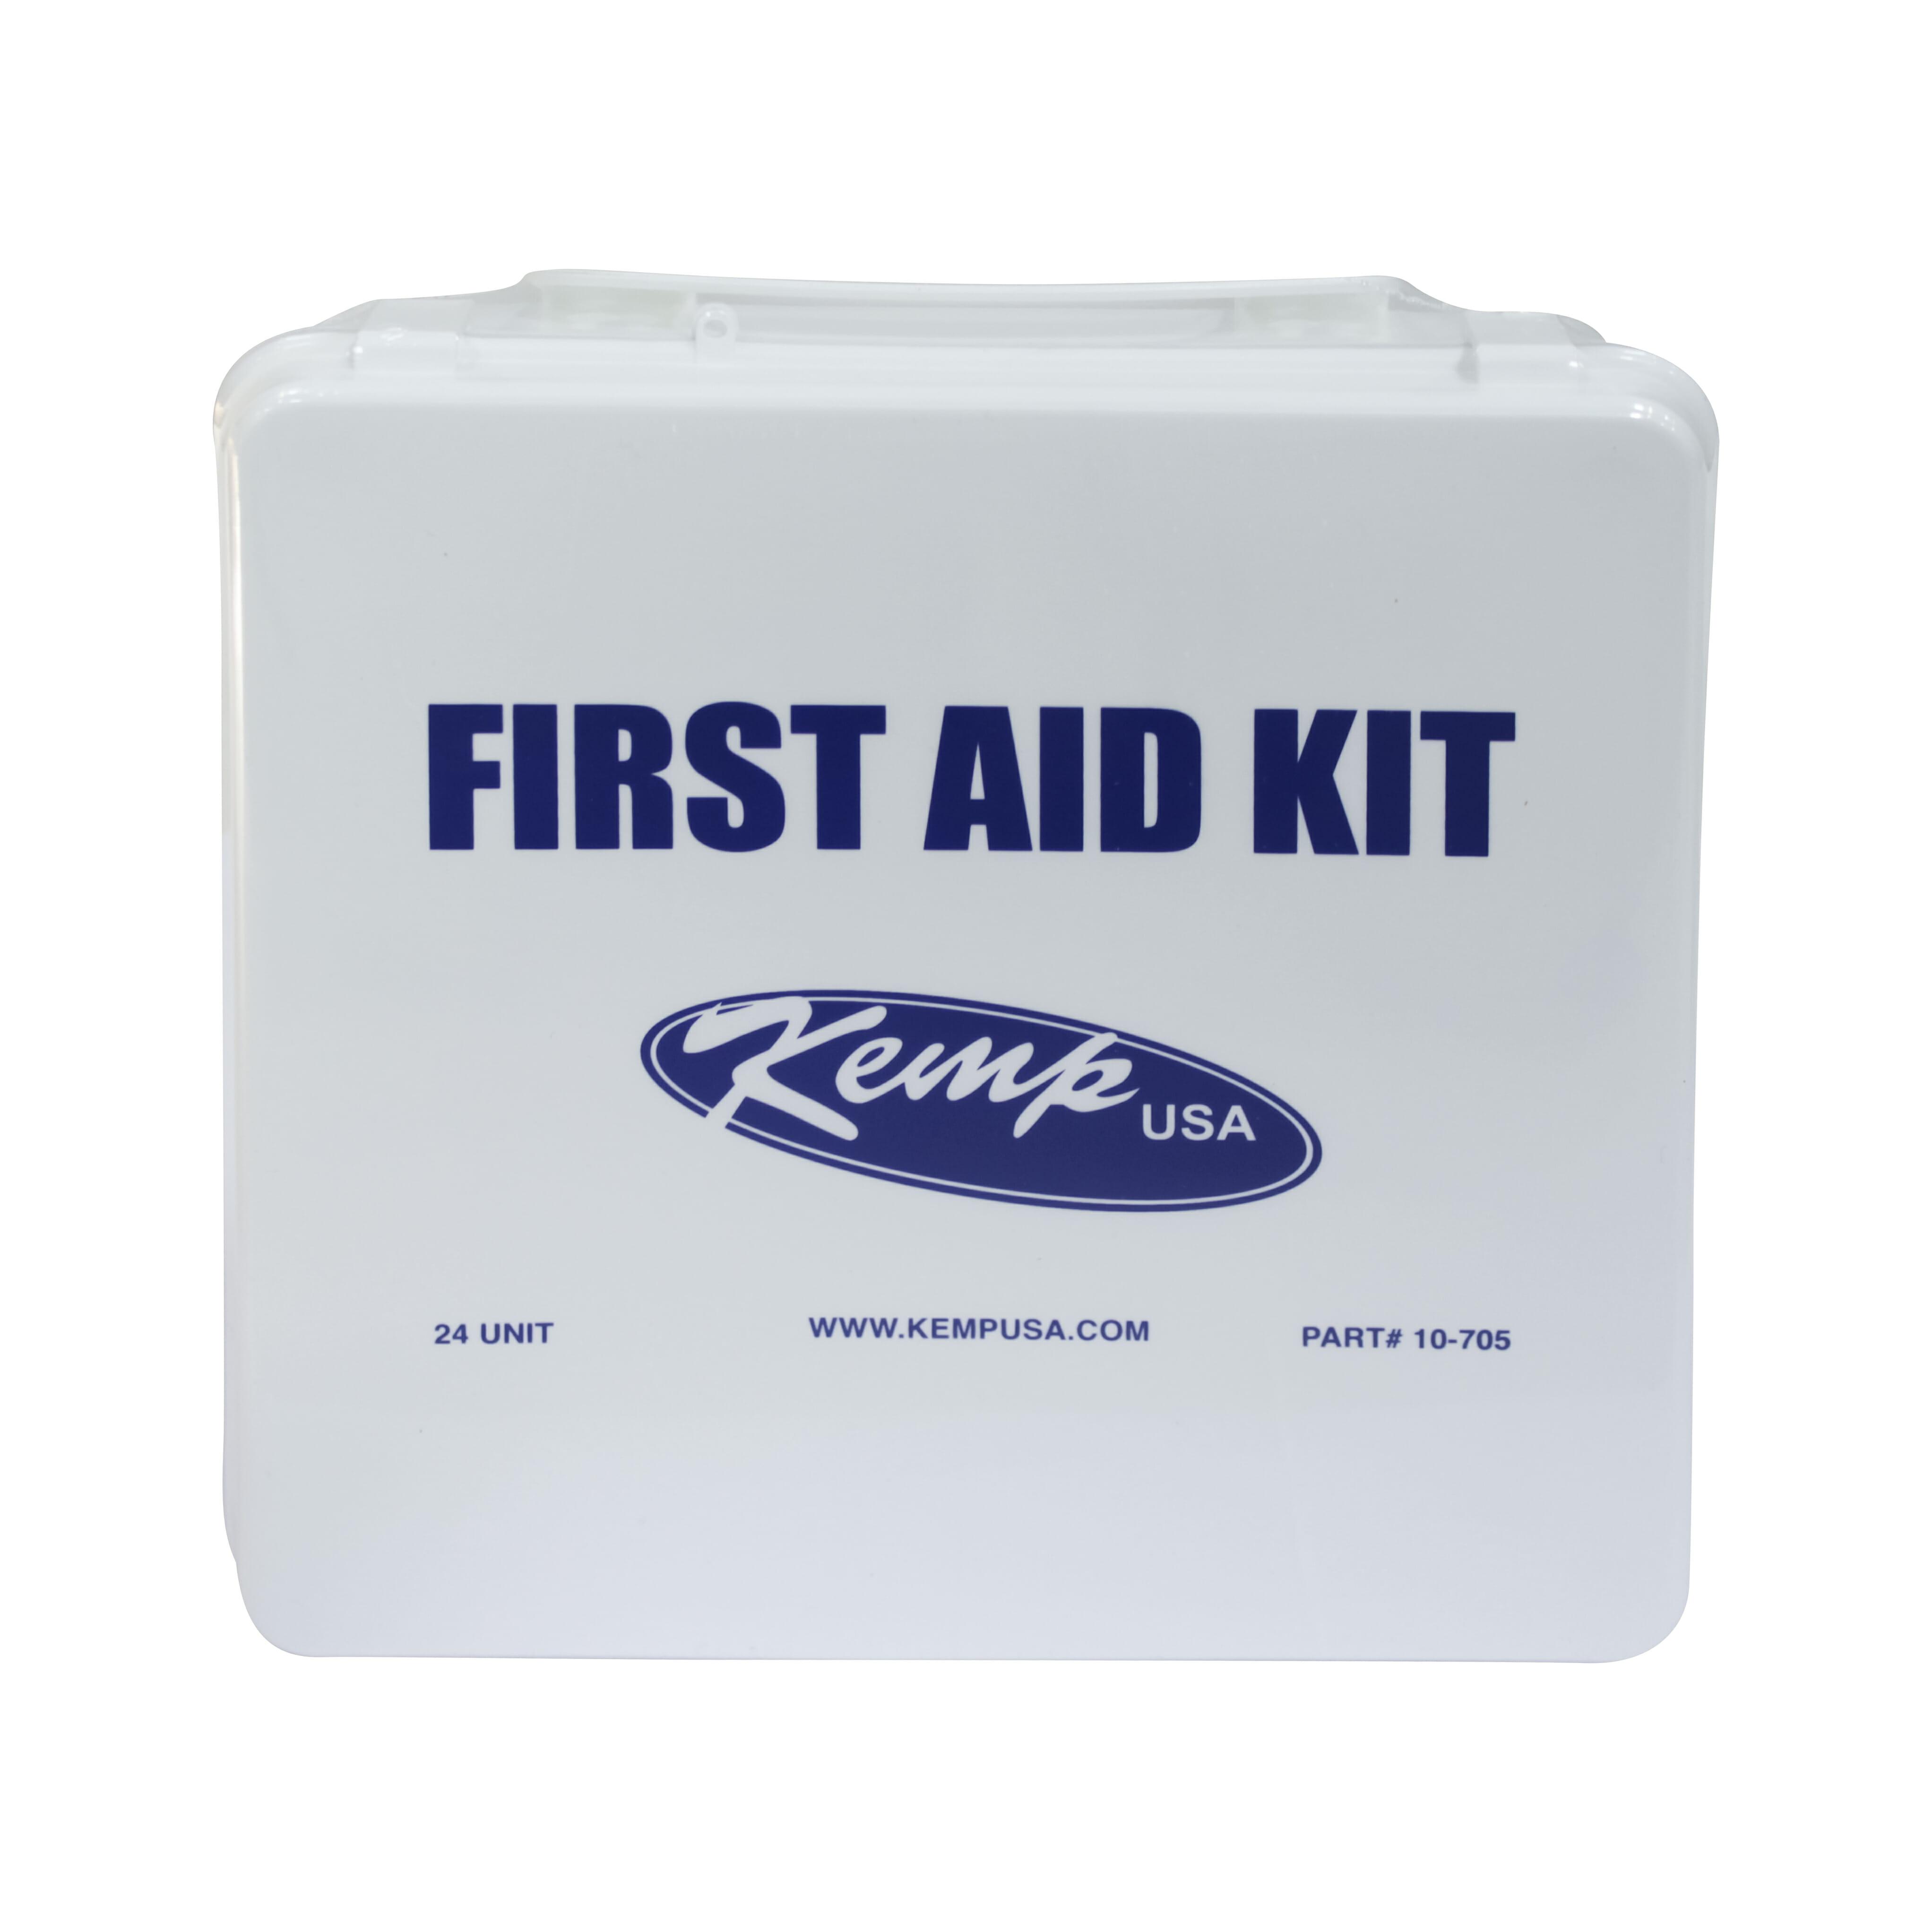 KEMP 35 Person 24 Unit First Aid Kit